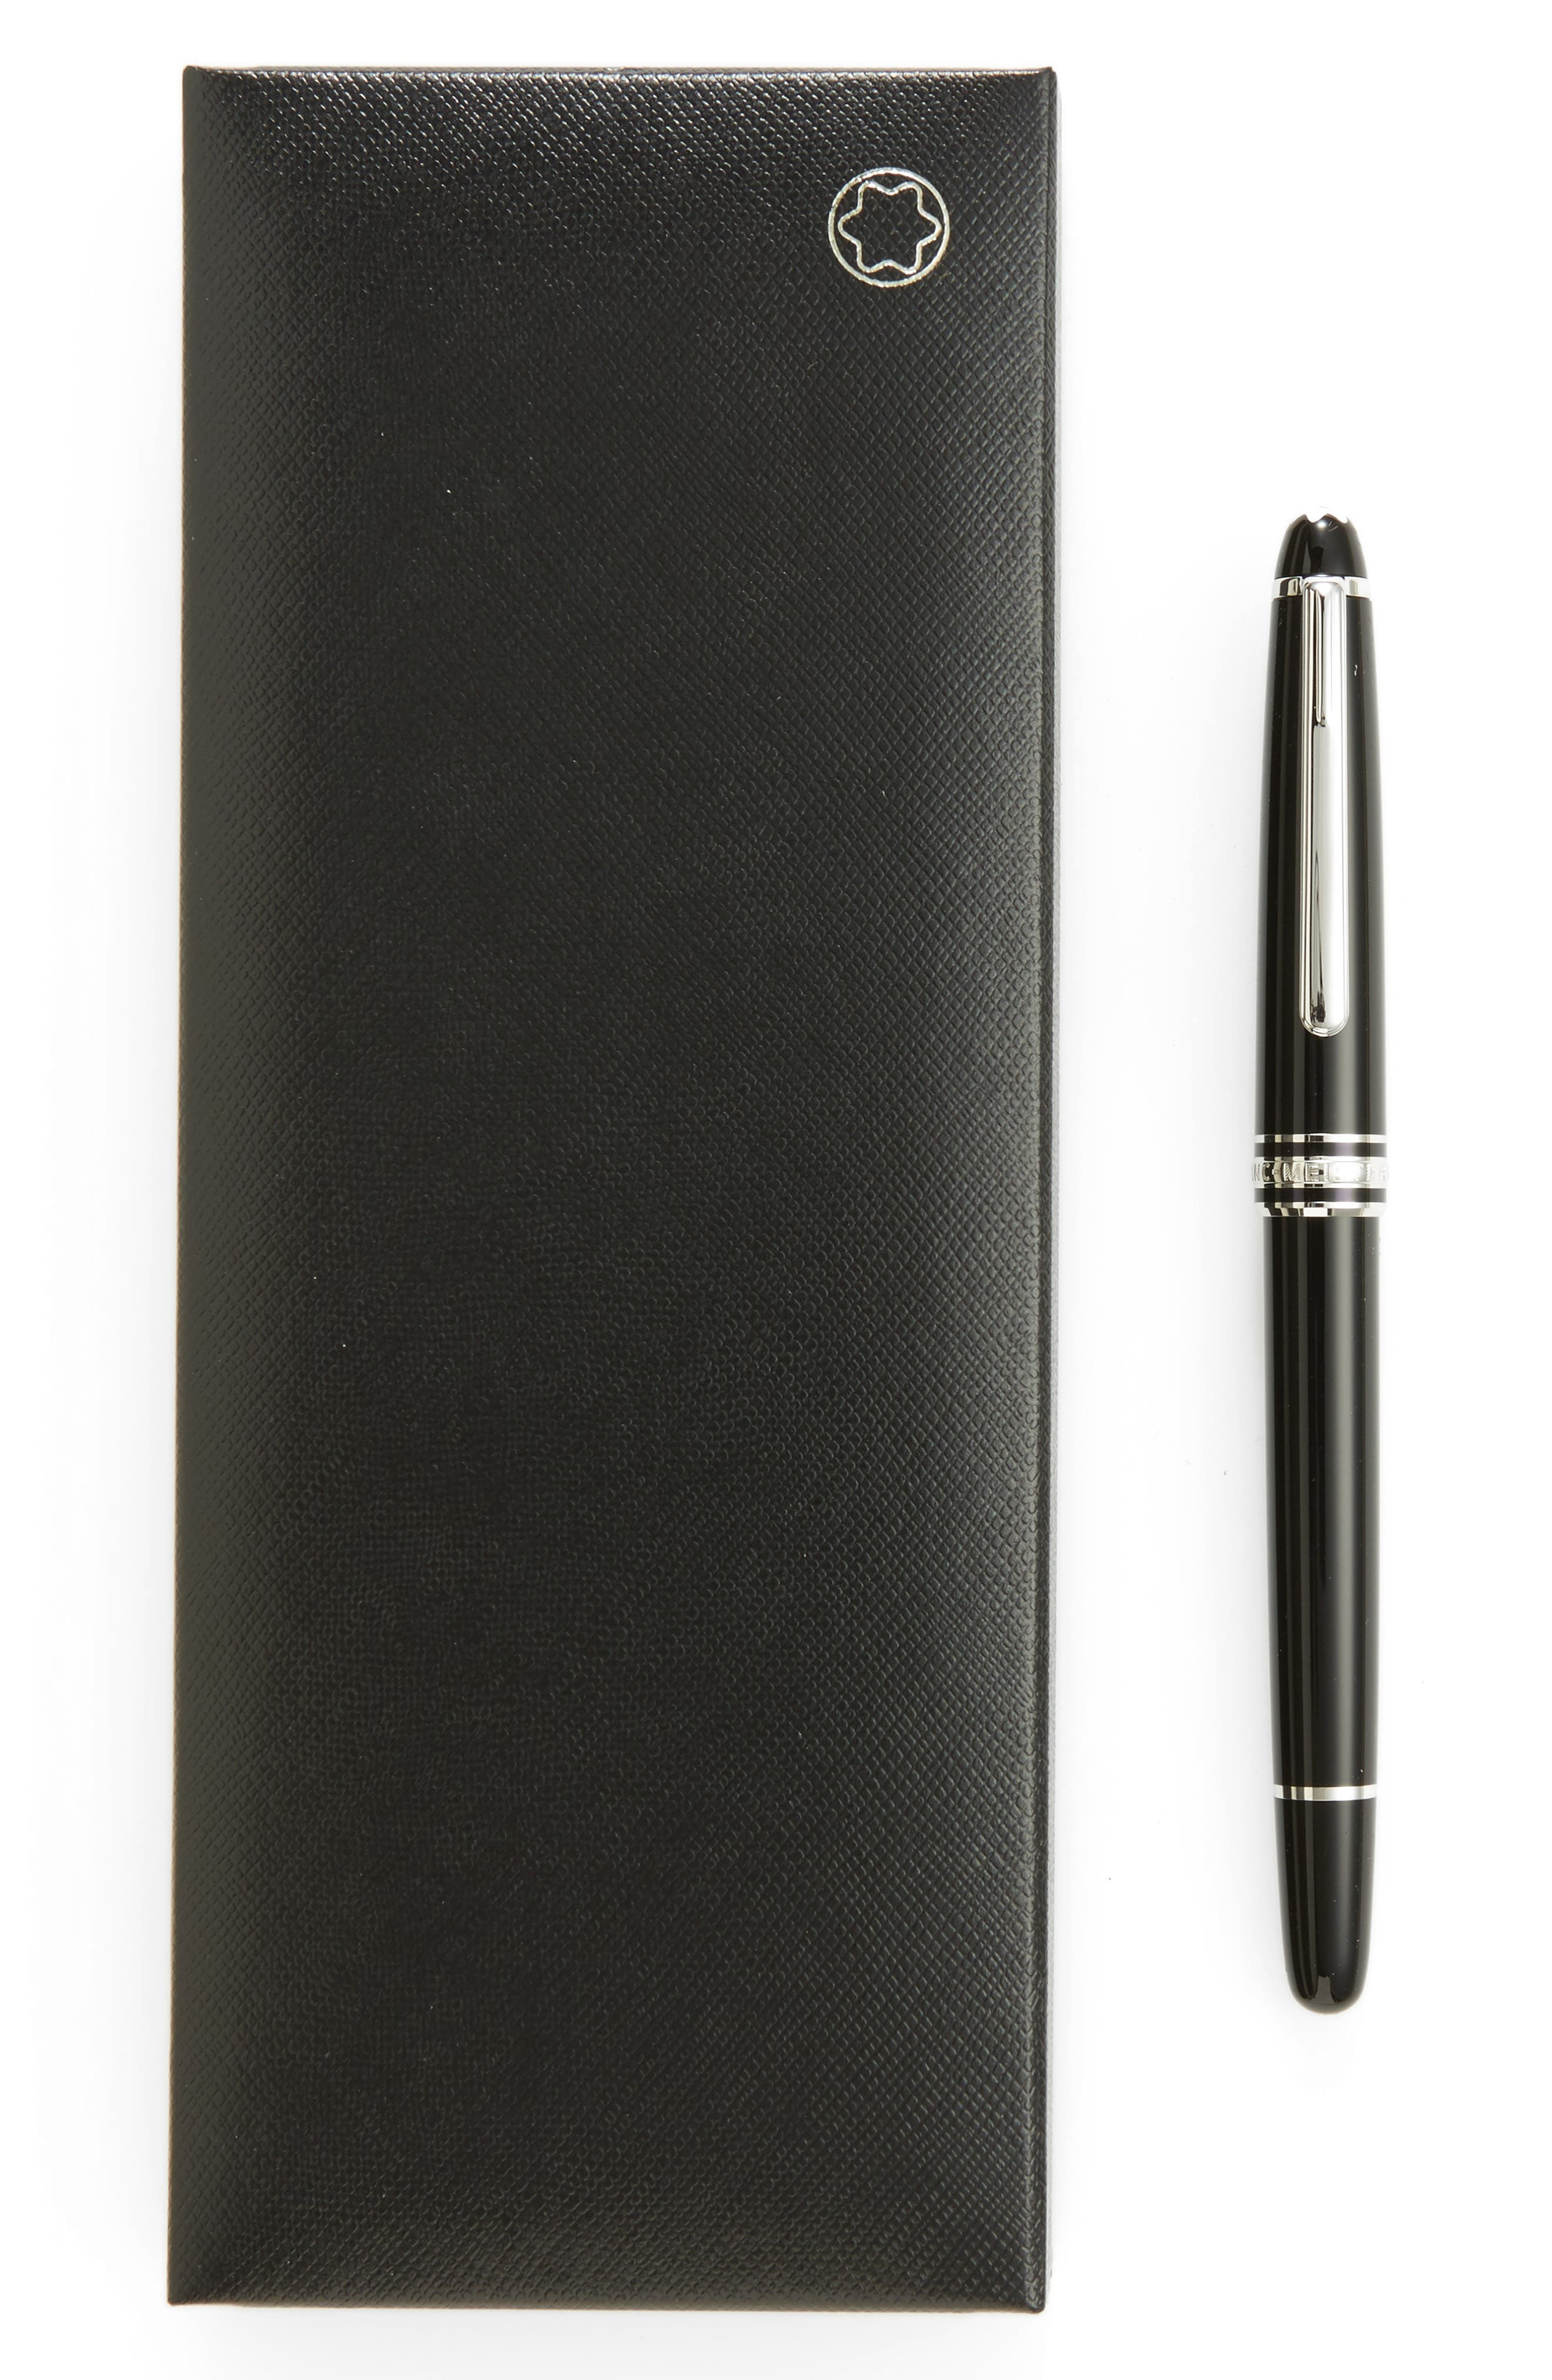 MONTBLANC Meisterstück Platinum Coated Classique Rollerball Pen